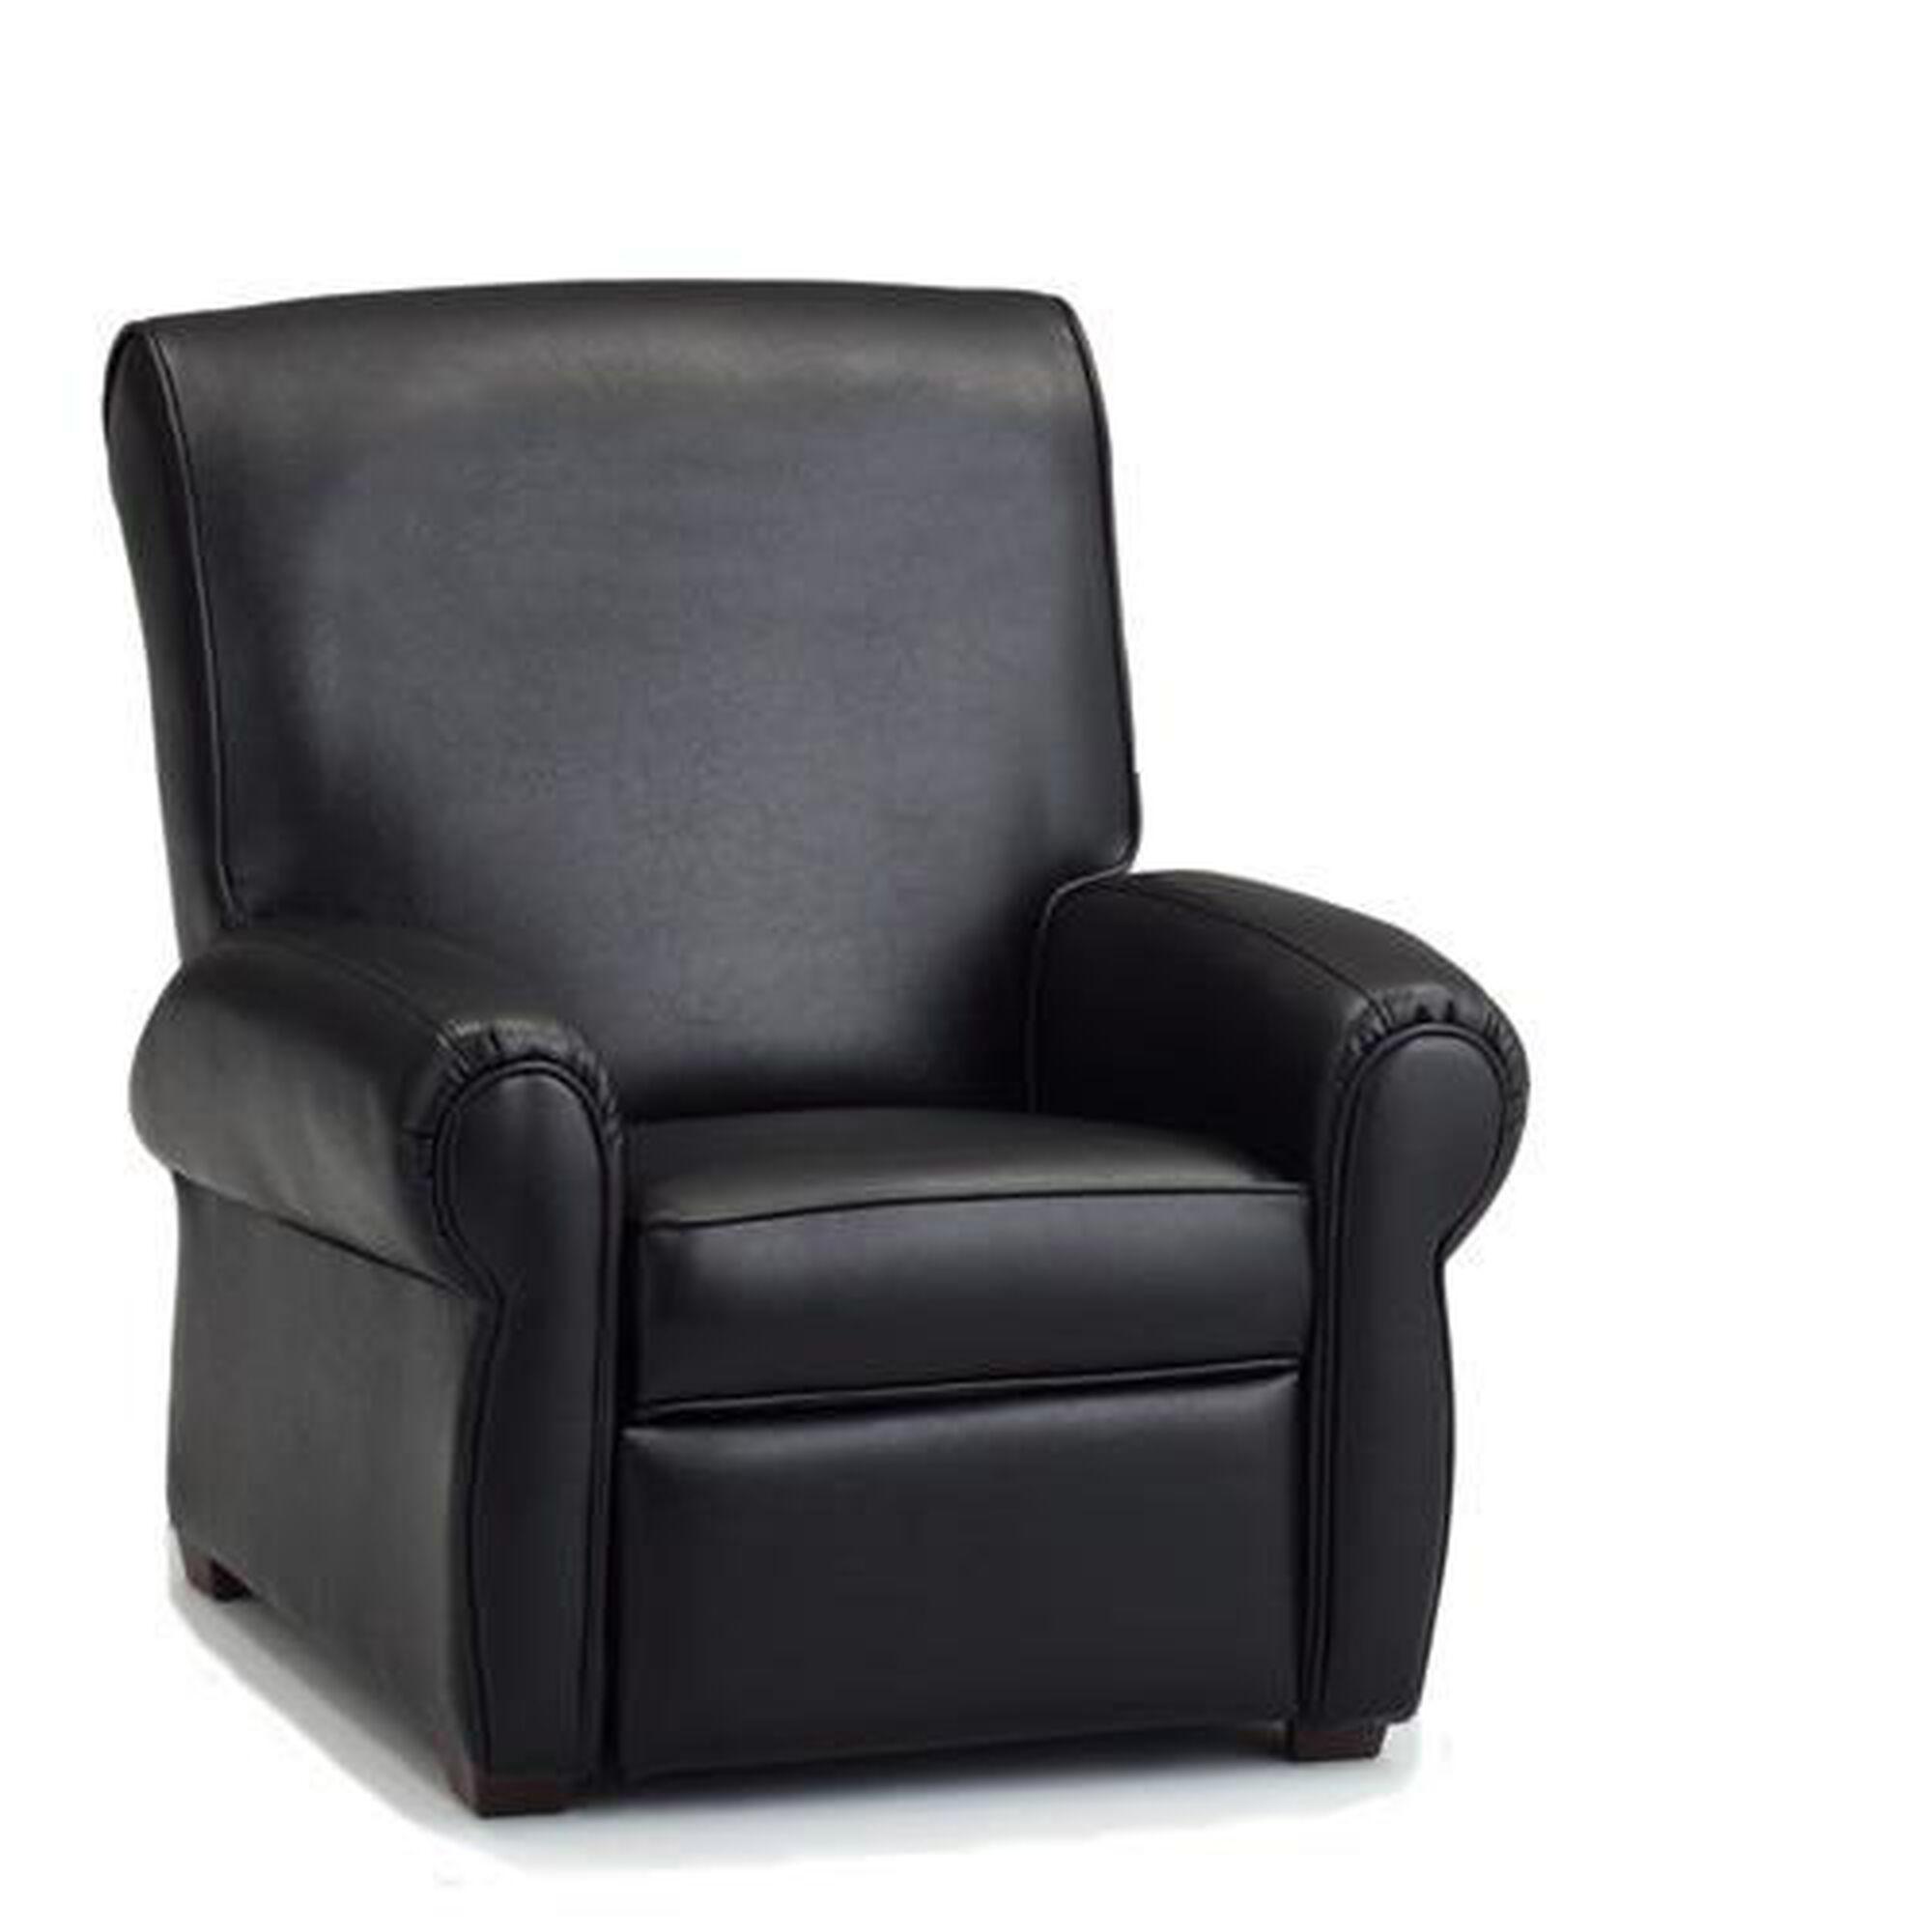 Sensational Big Kids Faux Leather Recliner Black Andrewgaddart Wooden Chair Designs For Living Room Andrewgaddartcom